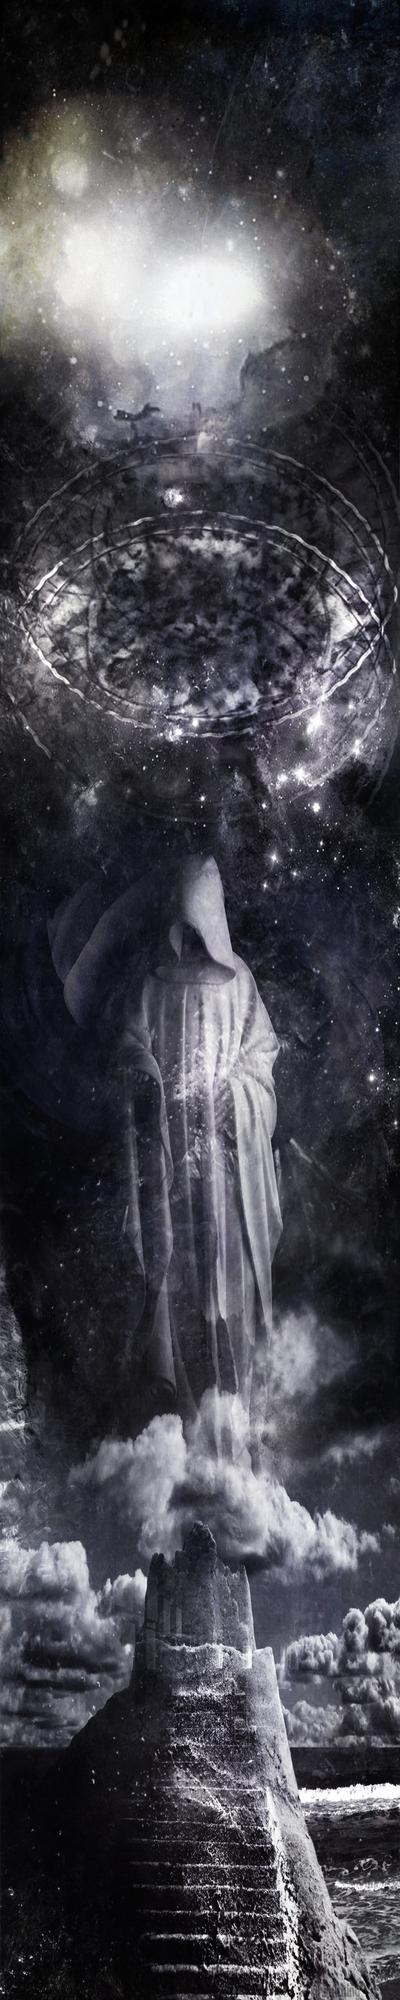 Astro Altar by TALONABRAXAS